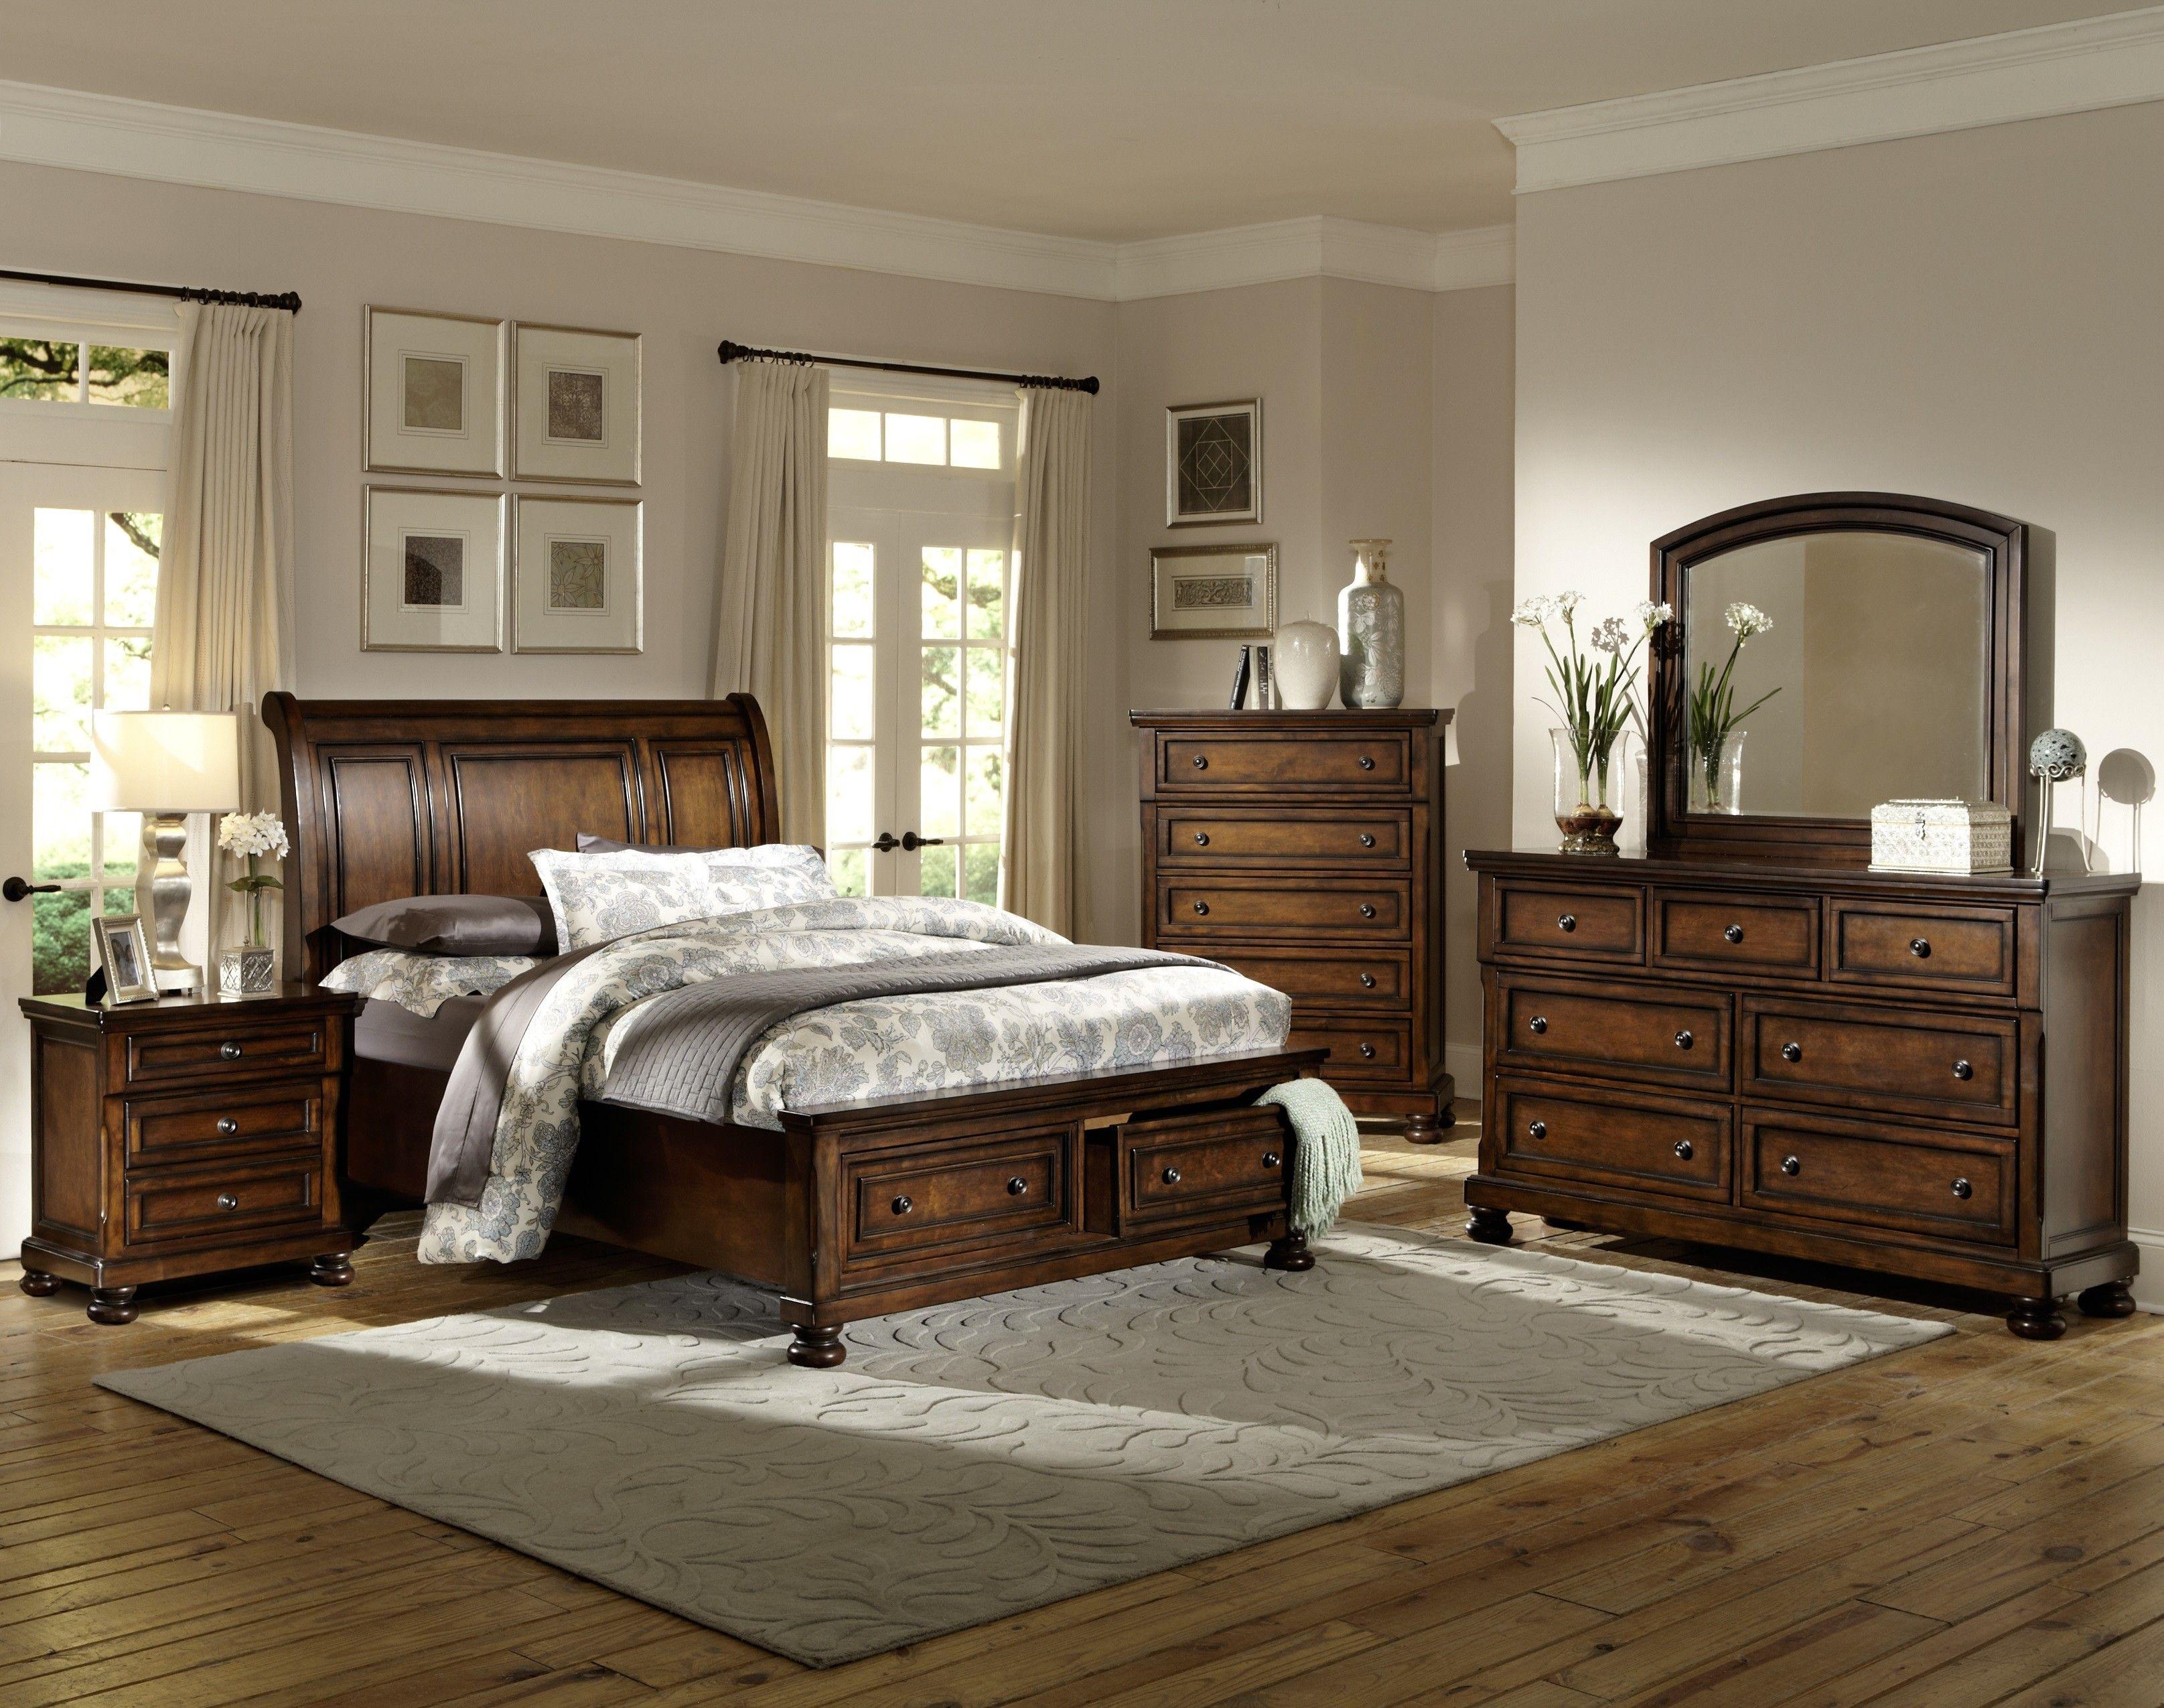 Transitional Dark Brown Storage Bedroom Stuff to Buy